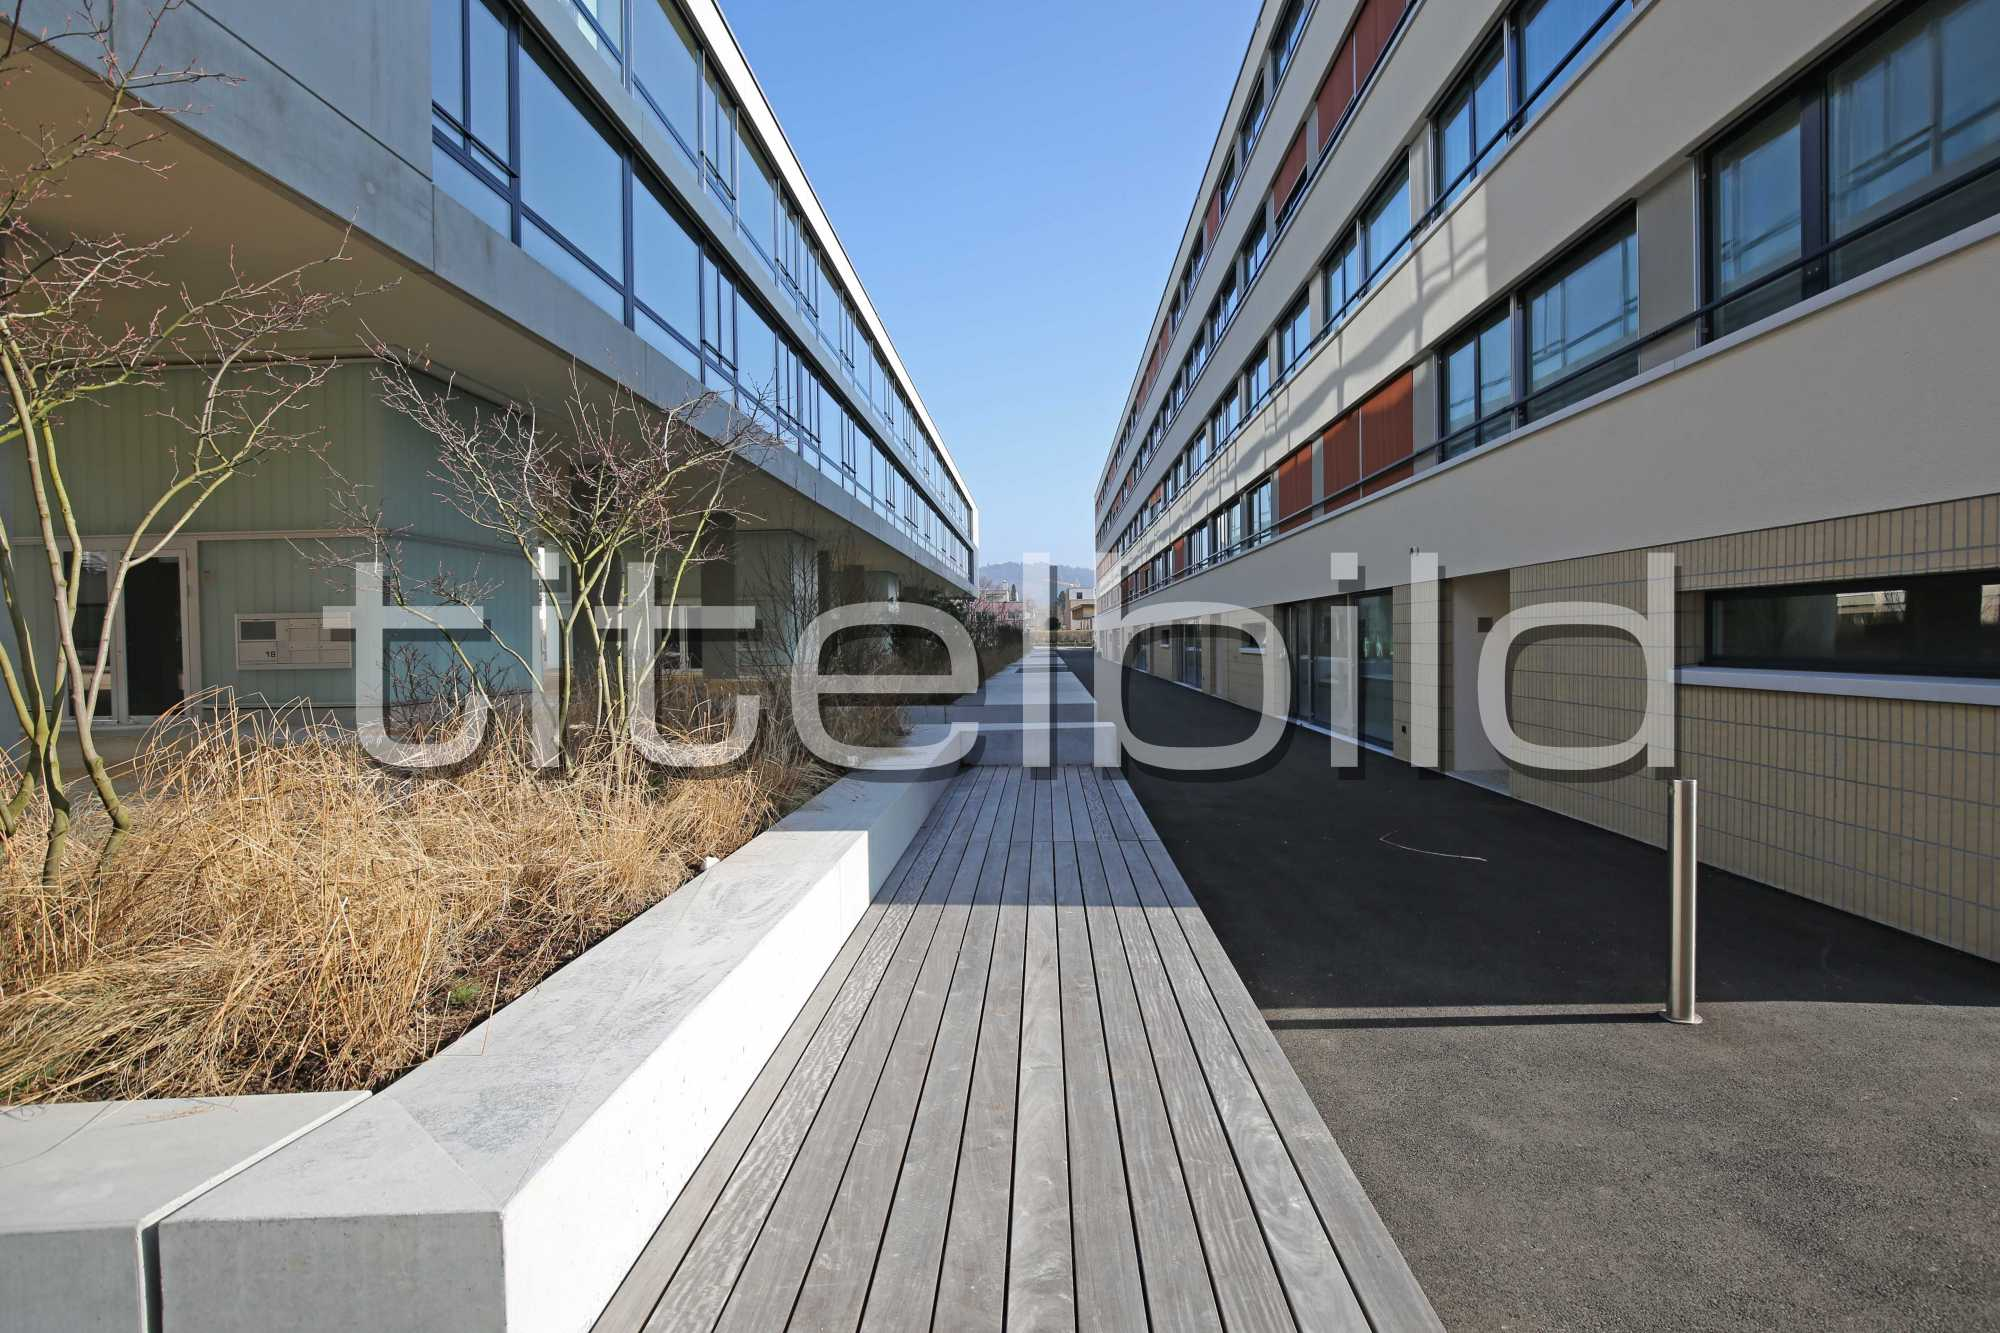 Projektbild-Nr. 4: Wohnüberbauung Am See